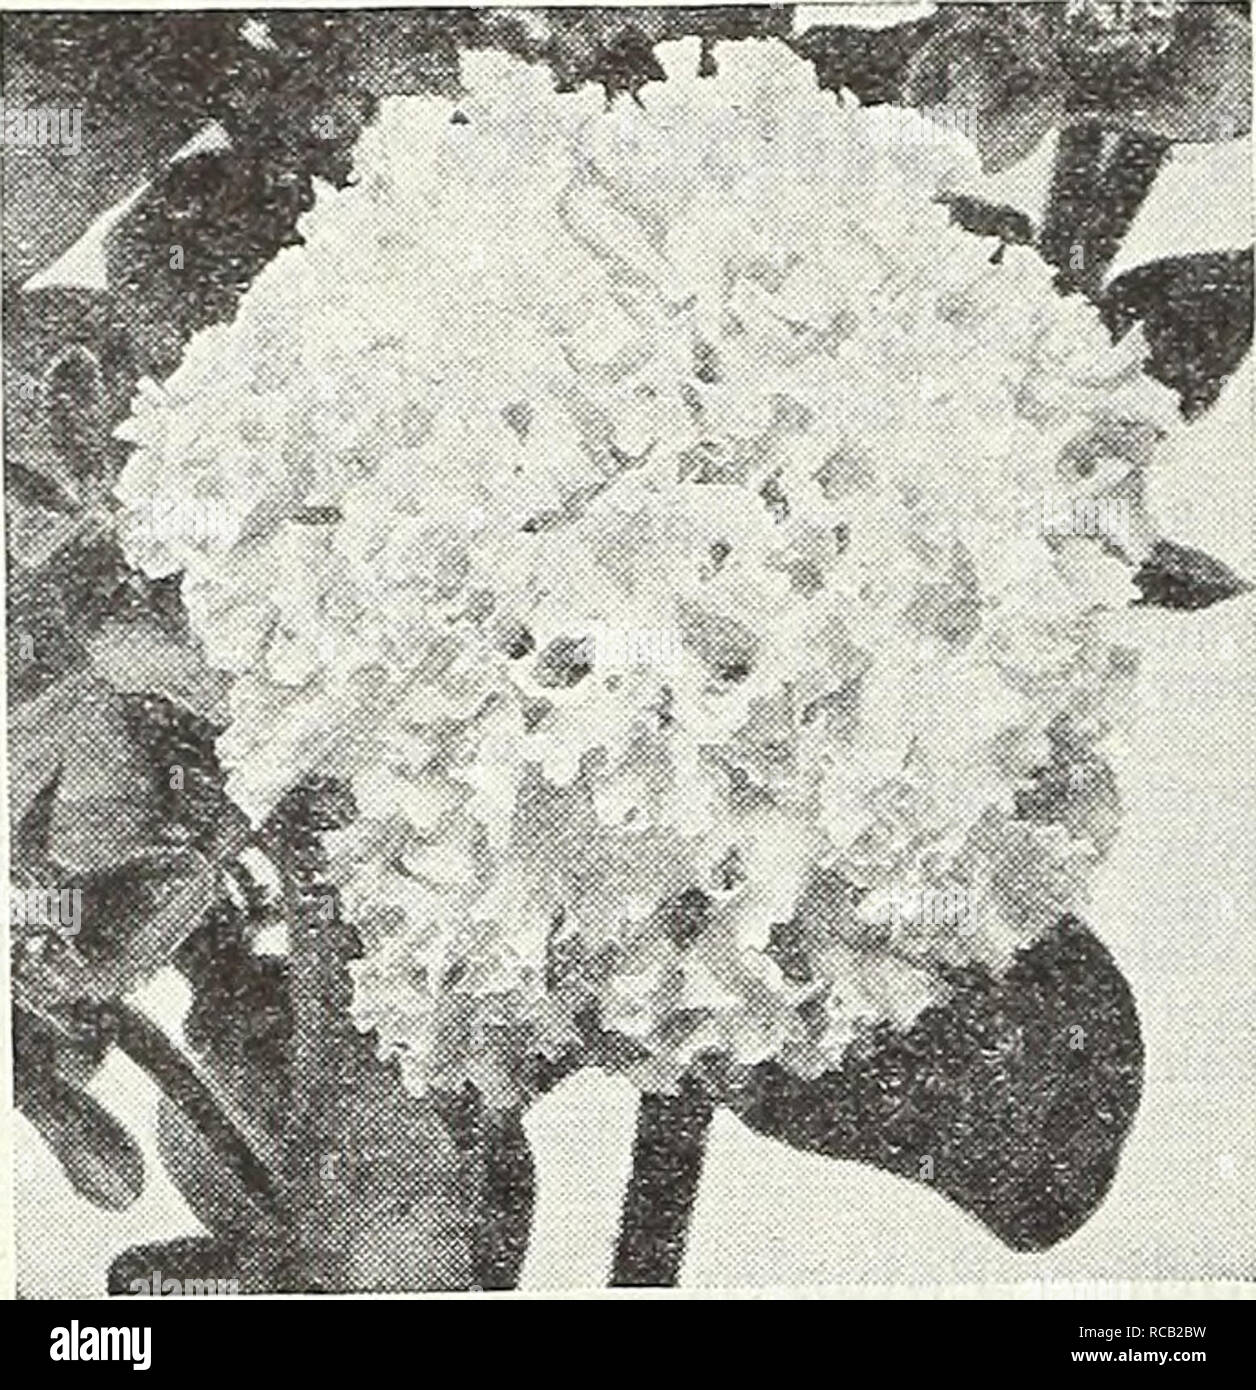 Dionne Monsanto (b. 1985),Marla Lukofsky Sex tube Debbie Lee Carrington,Jan Hunt